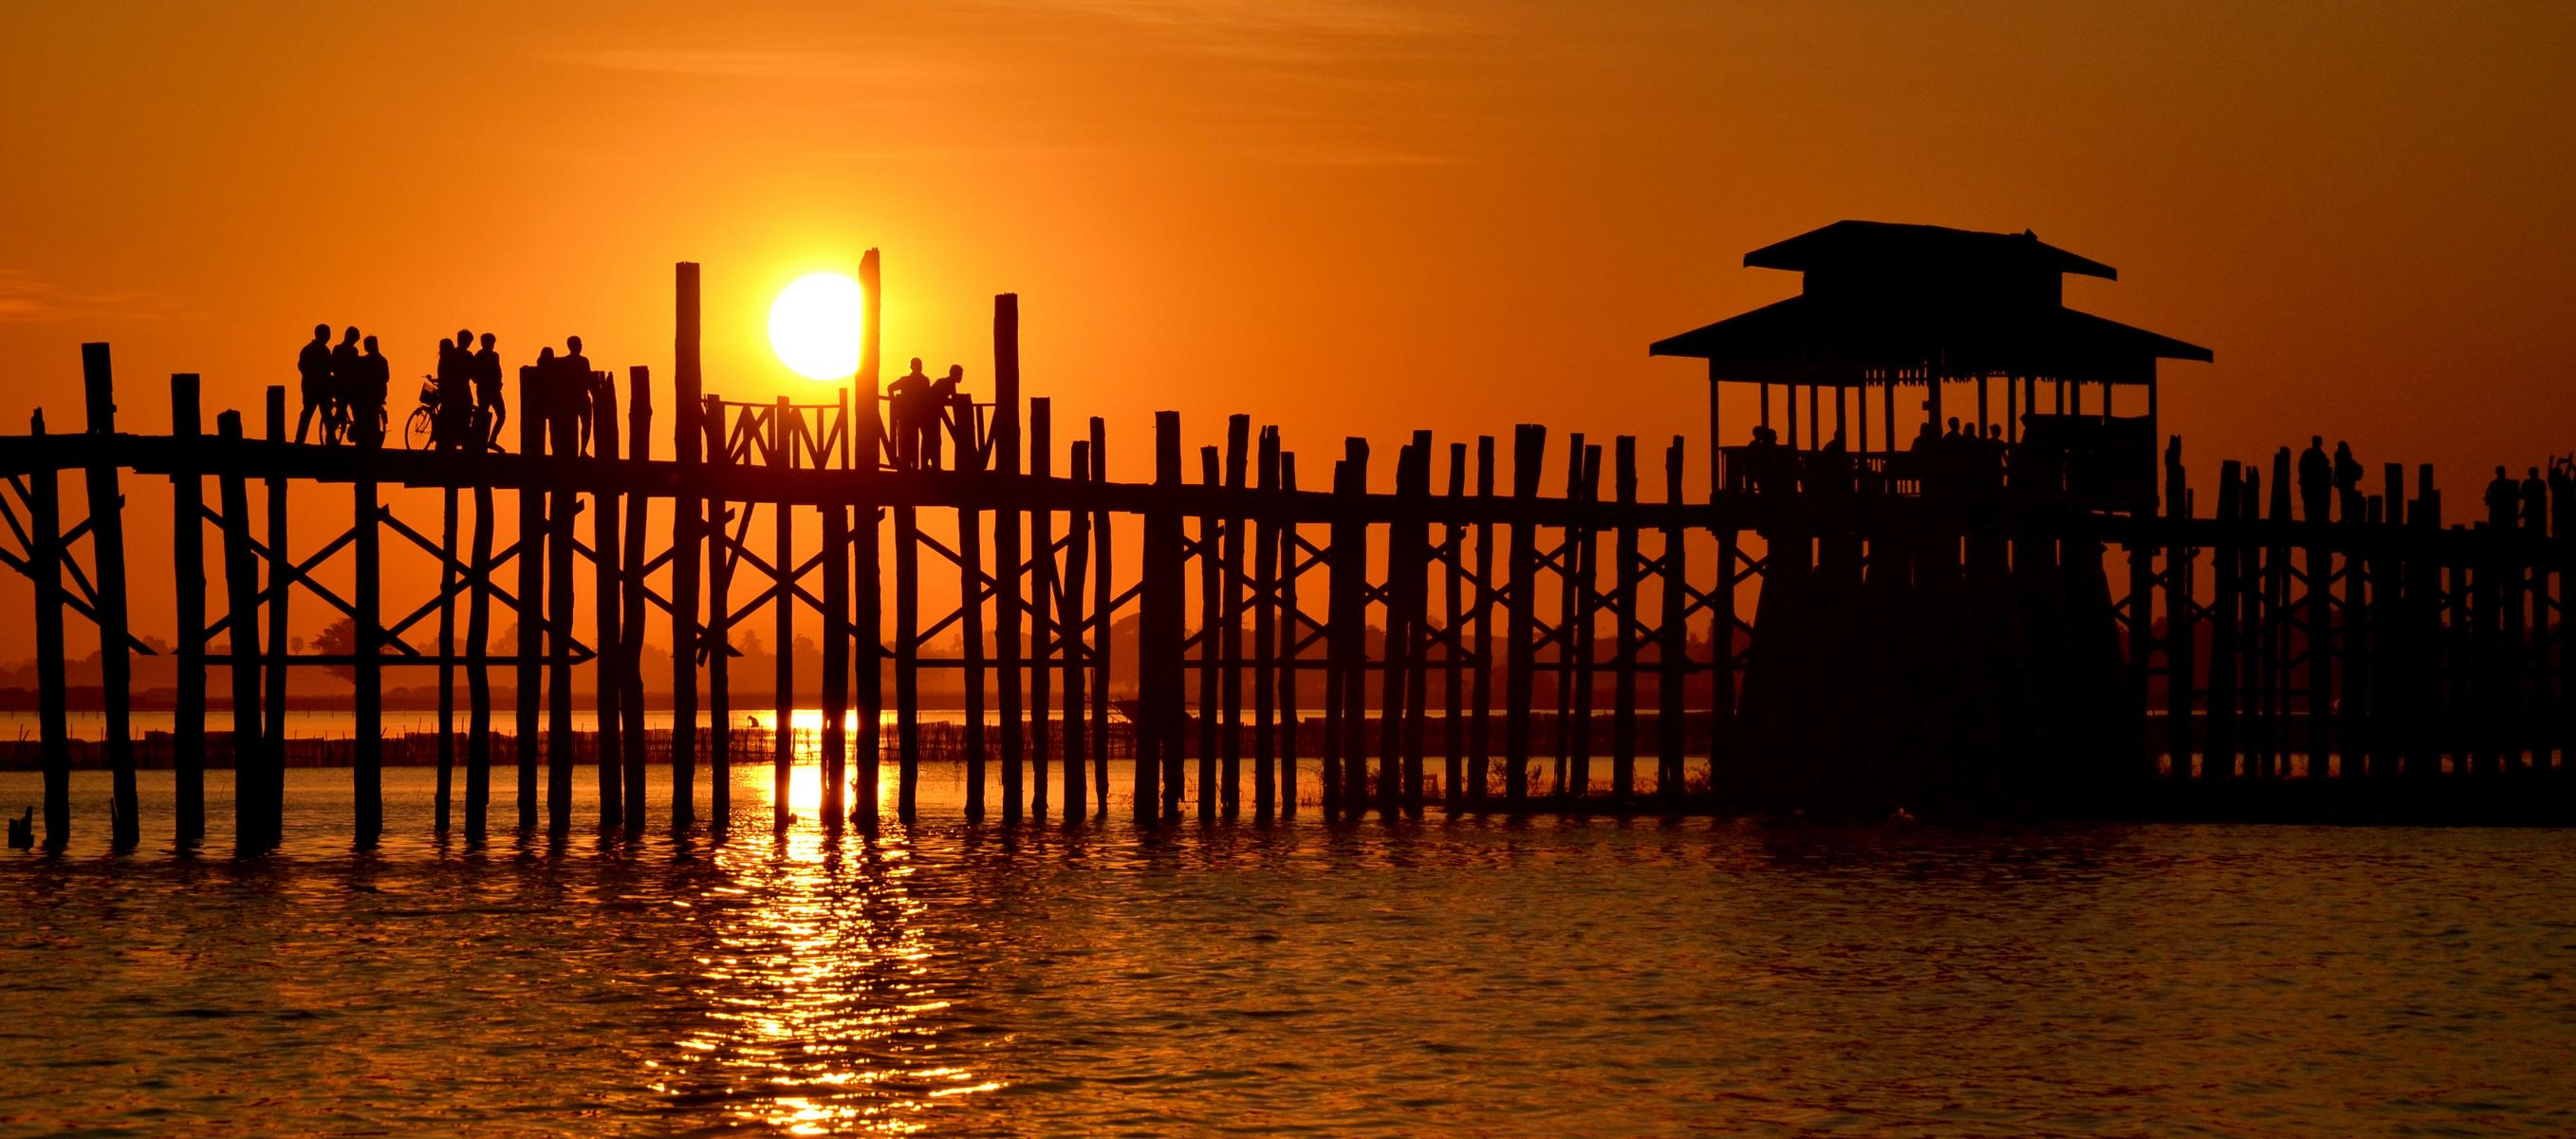 Die U Bein Brücke in Amarapura bei Mandalay in Myanmar im Sonnenuntergang